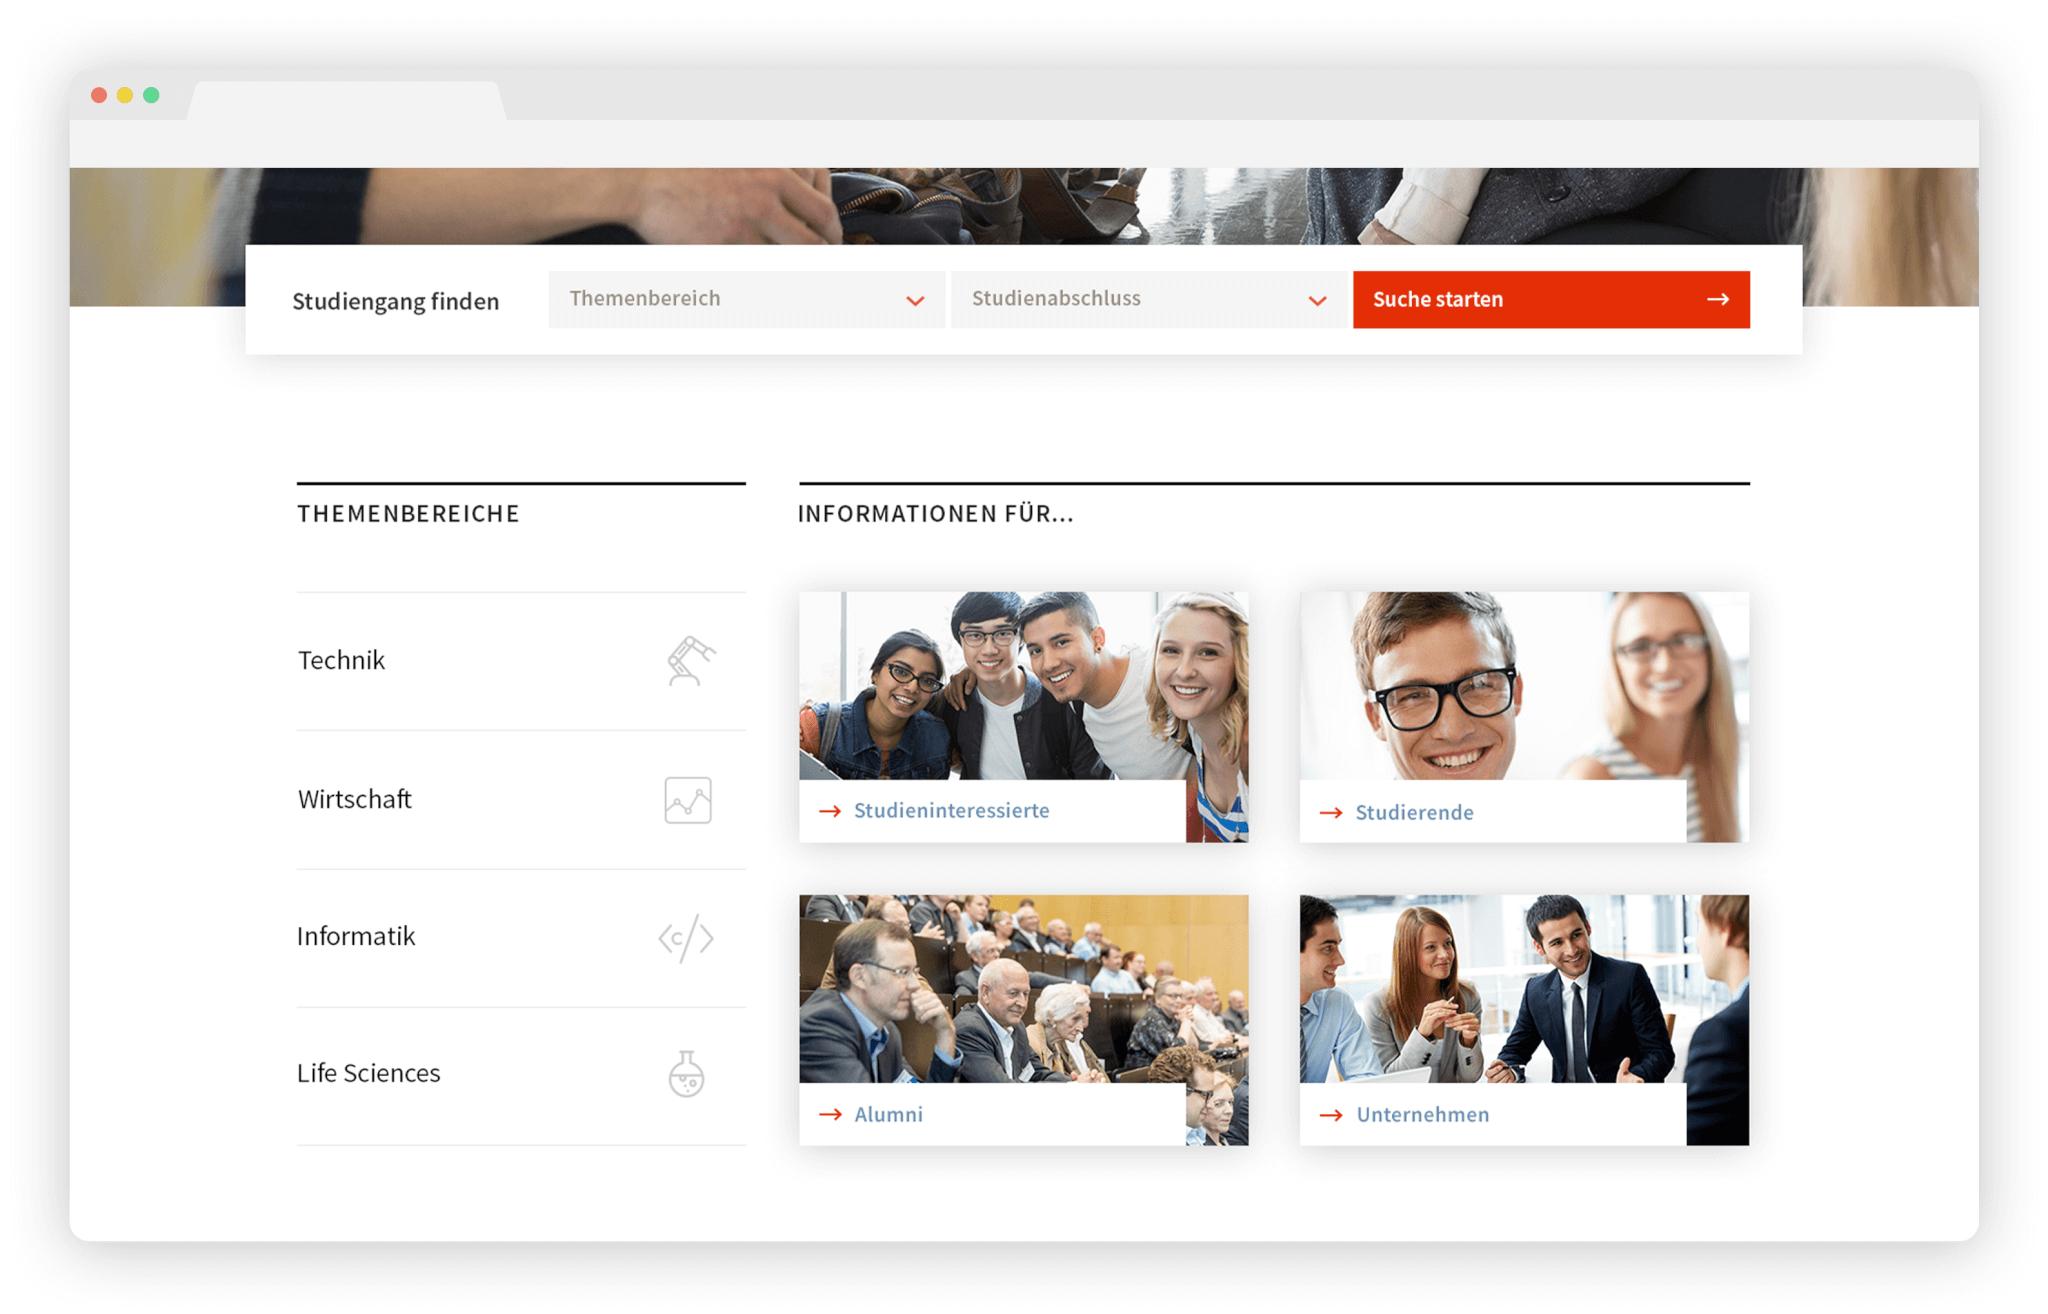 Website-Relaunch Hochschulen: Verschiedene Zugänge schaffen